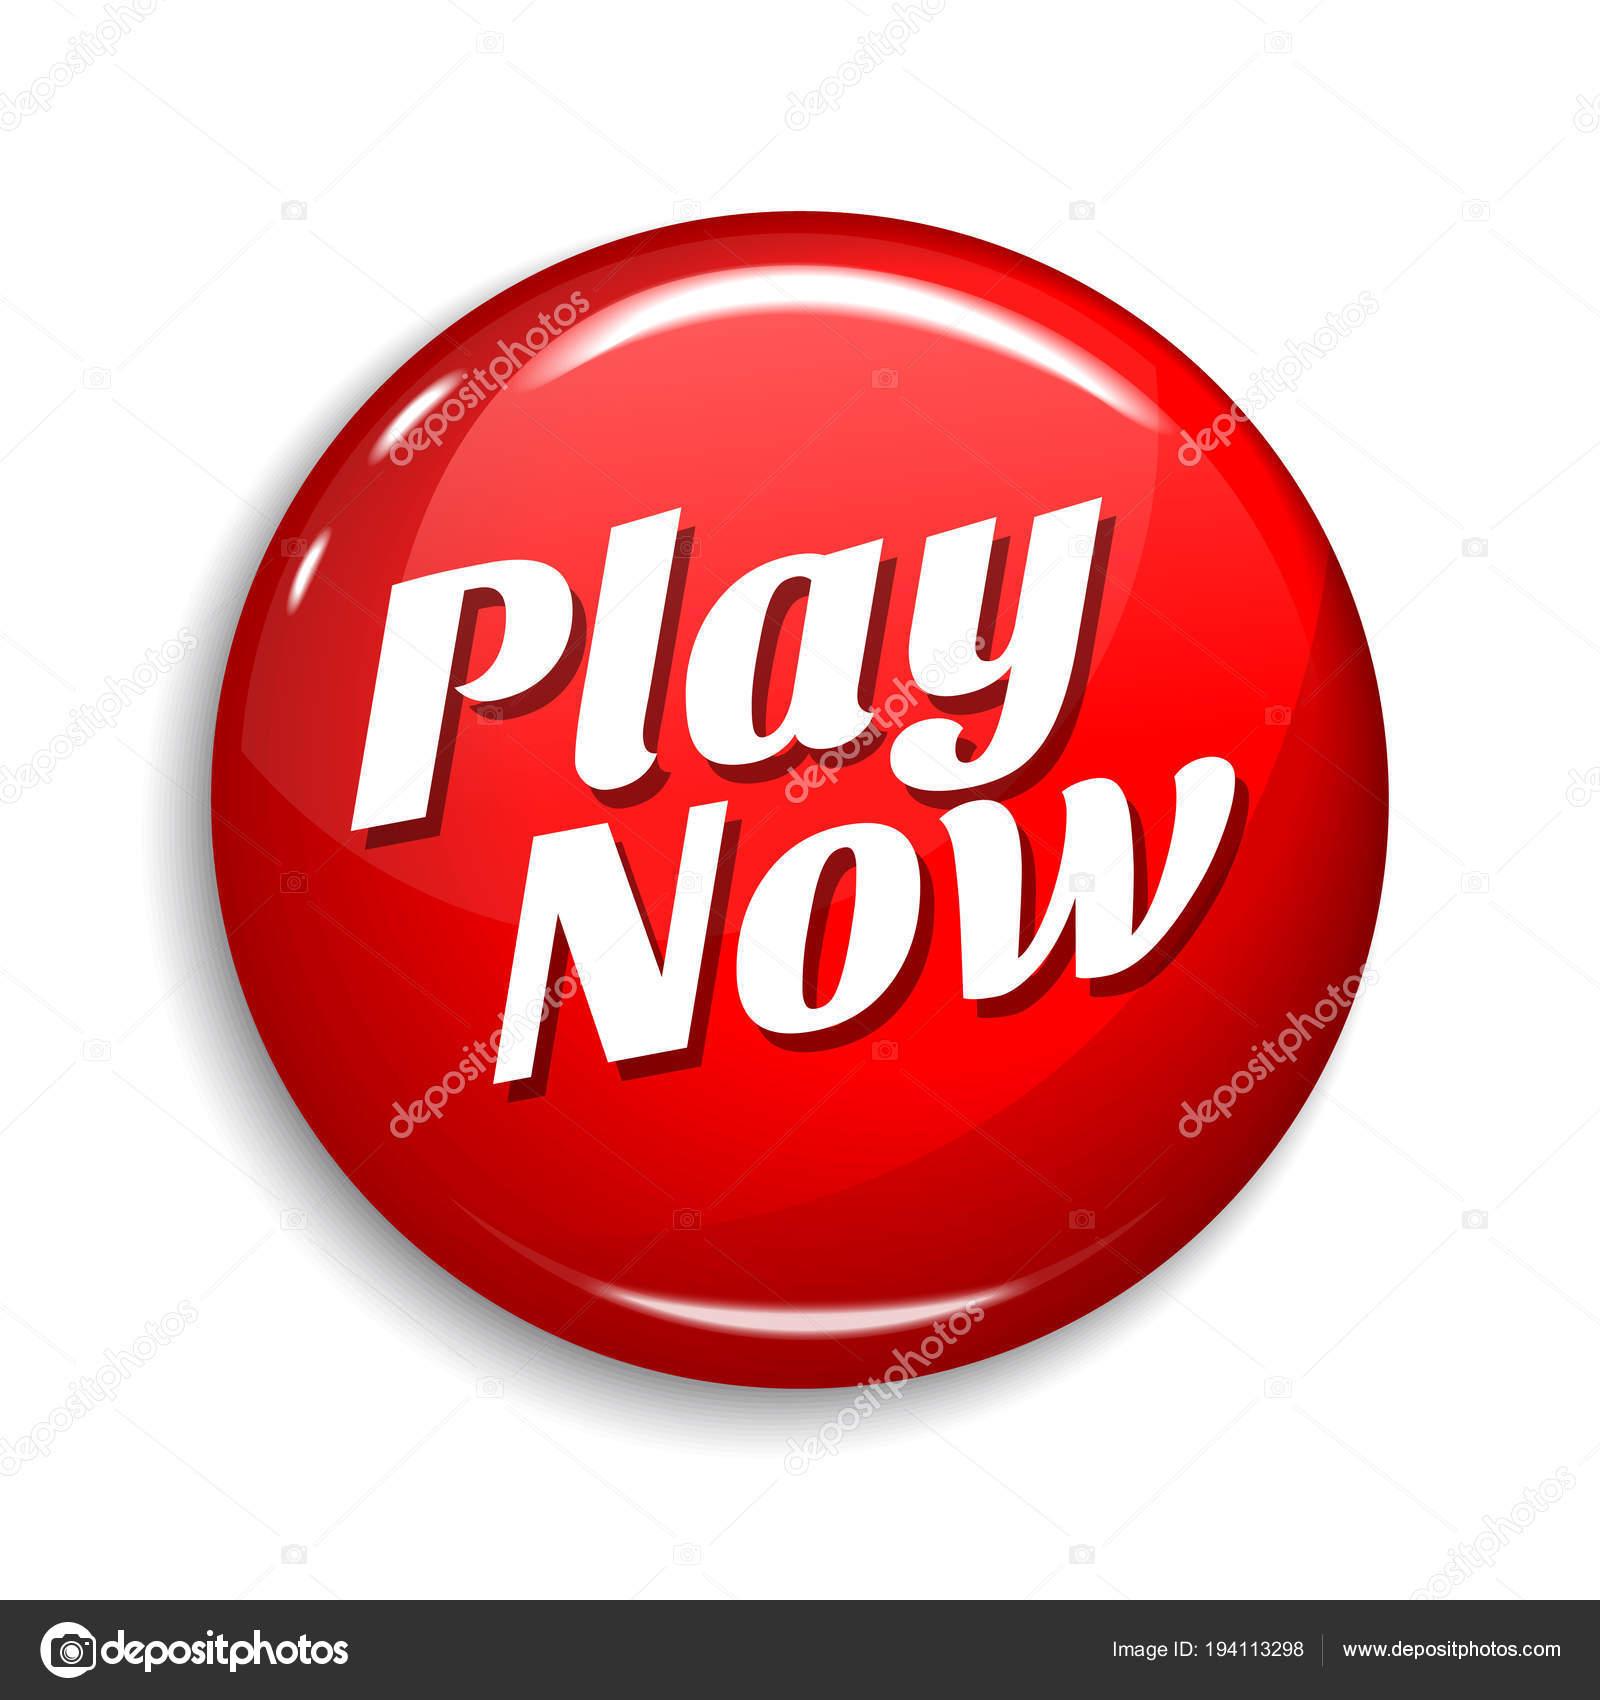 Jetztspielen